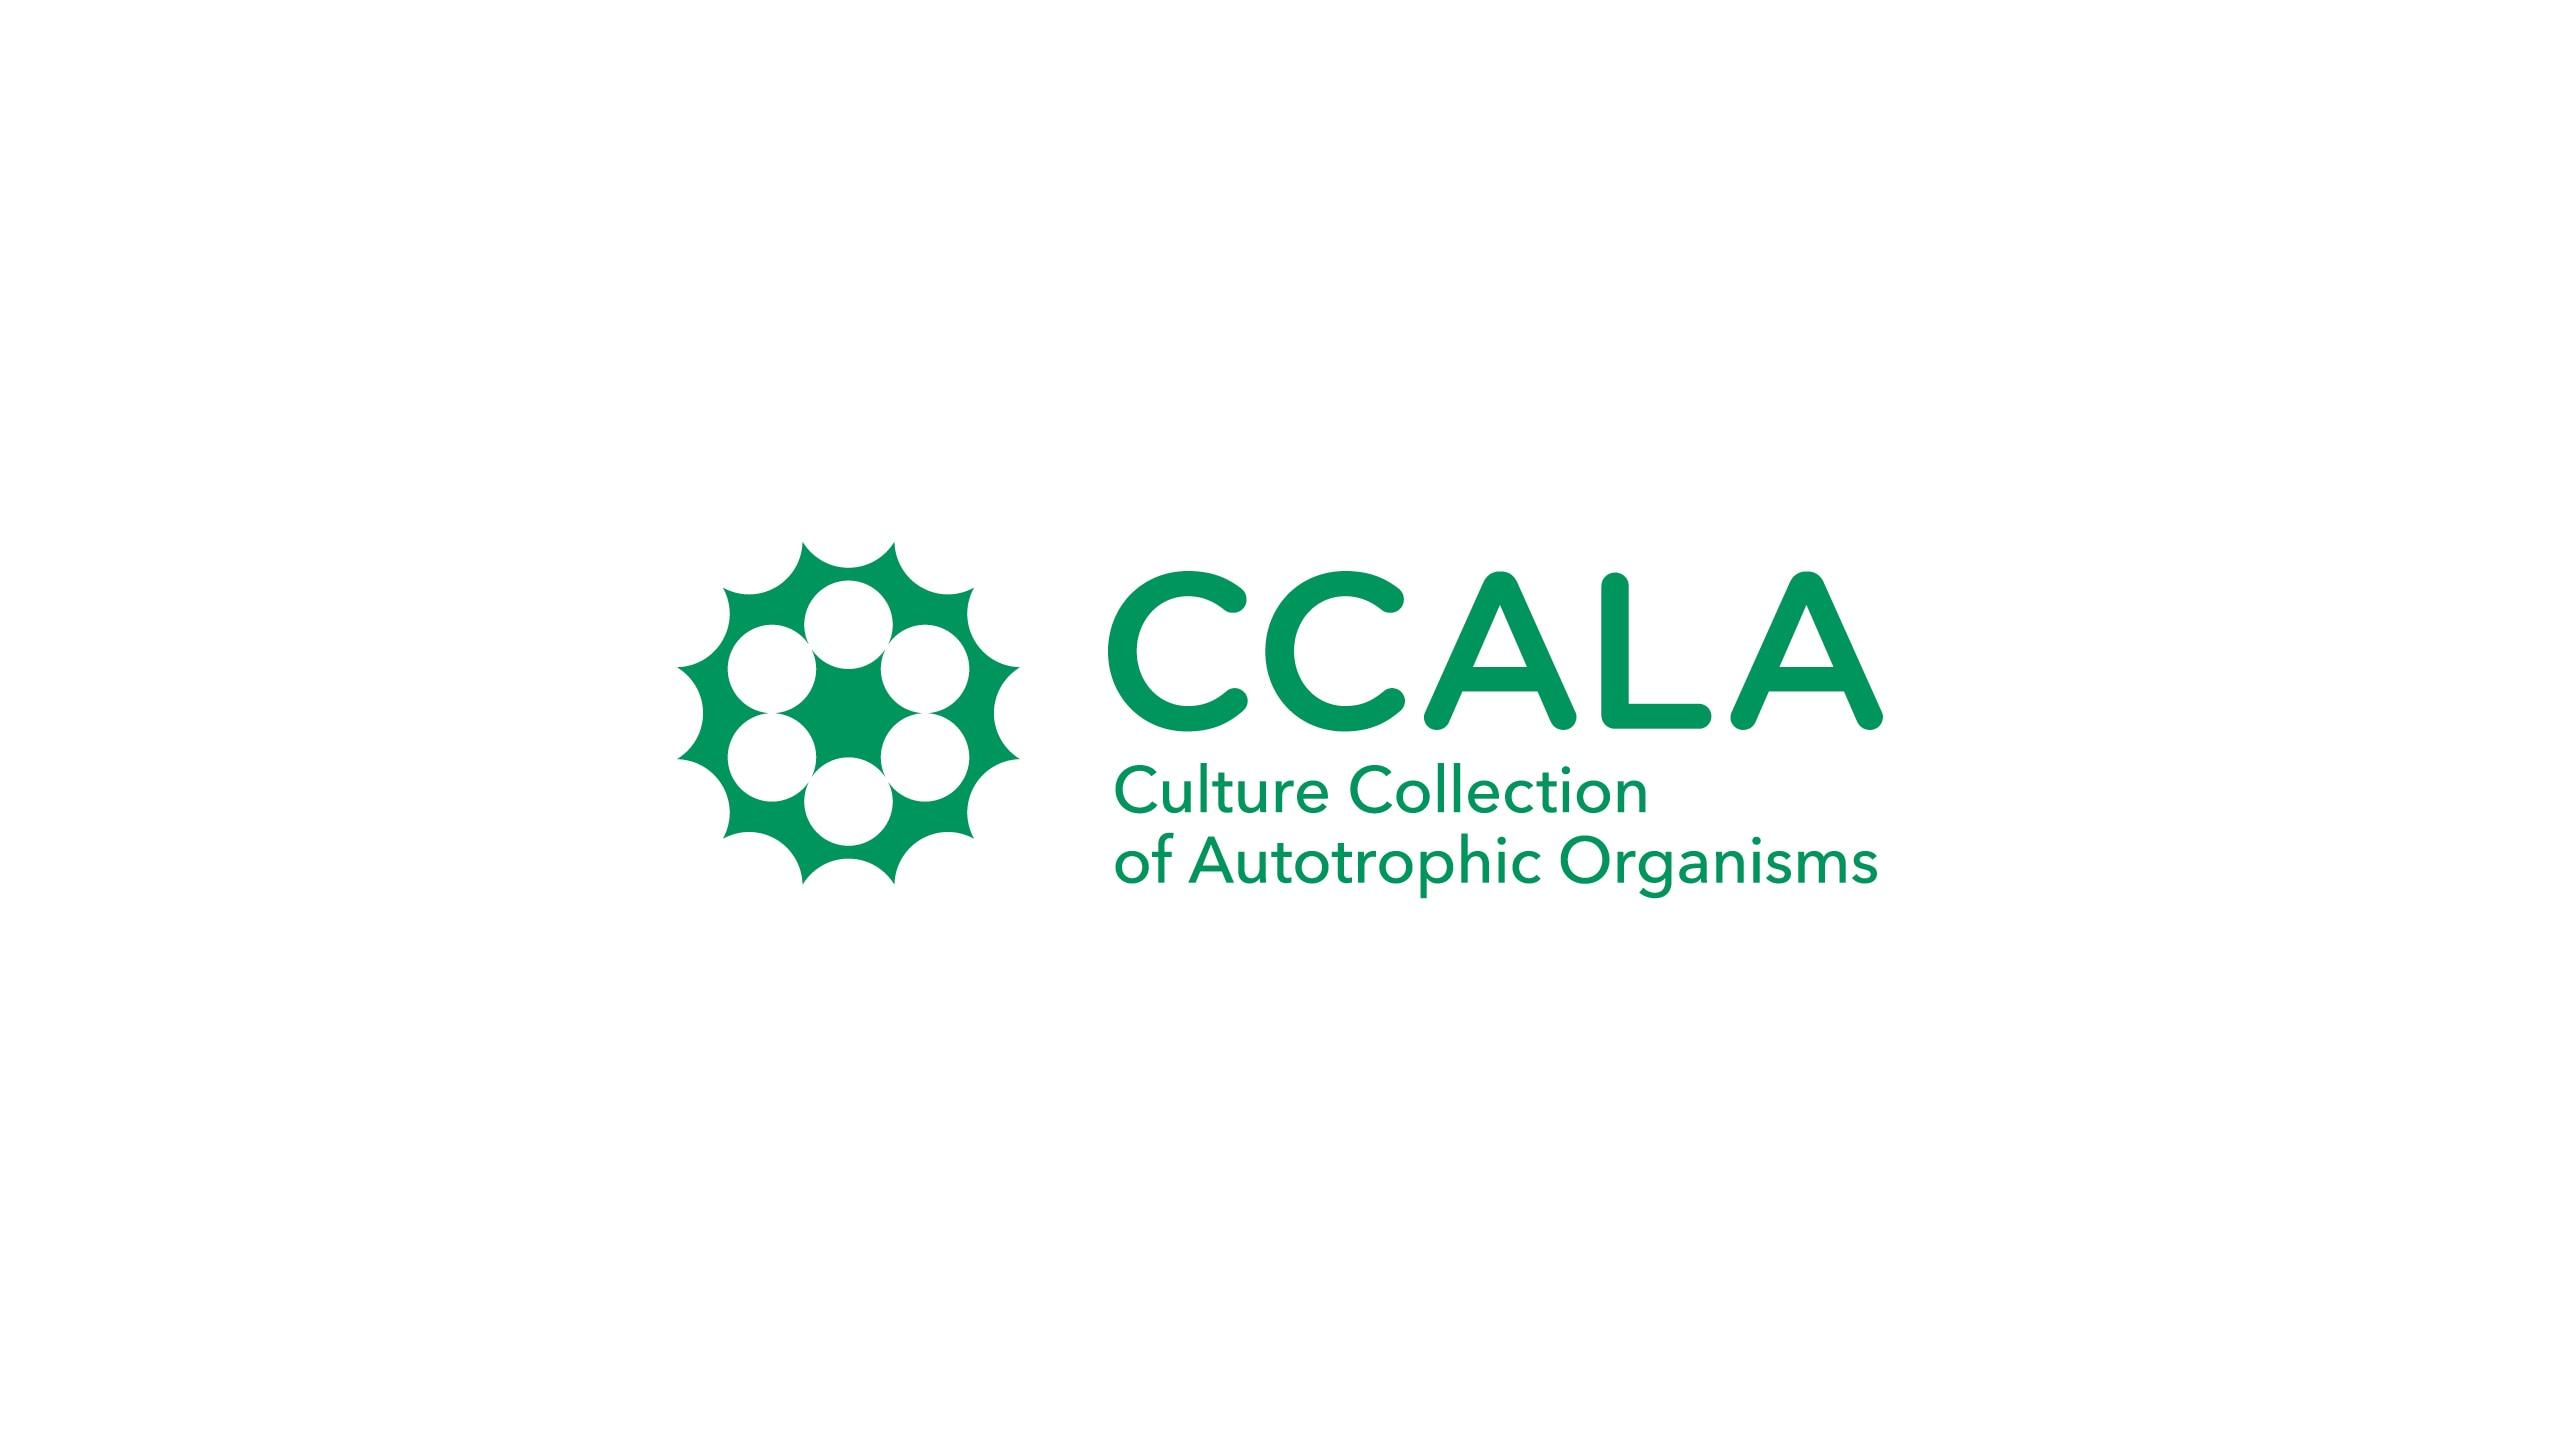 CCALA_1